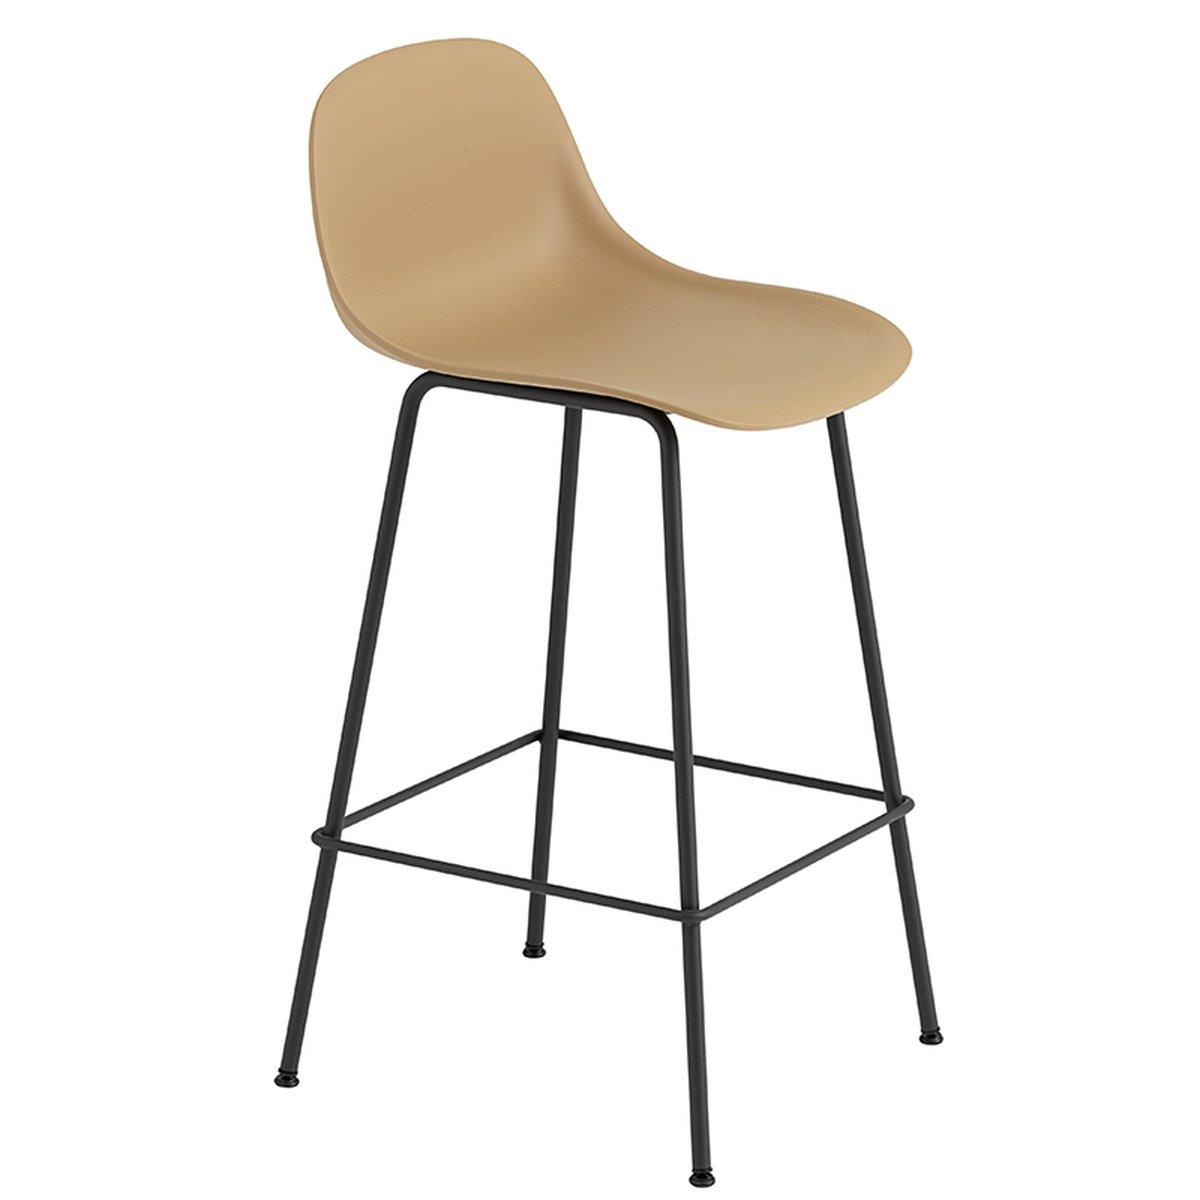 Remarkable Fiber Bar Stool With Backrest Tube Base Ochre Black Beatyapartments Chair Design Images Beatyapartmentscom